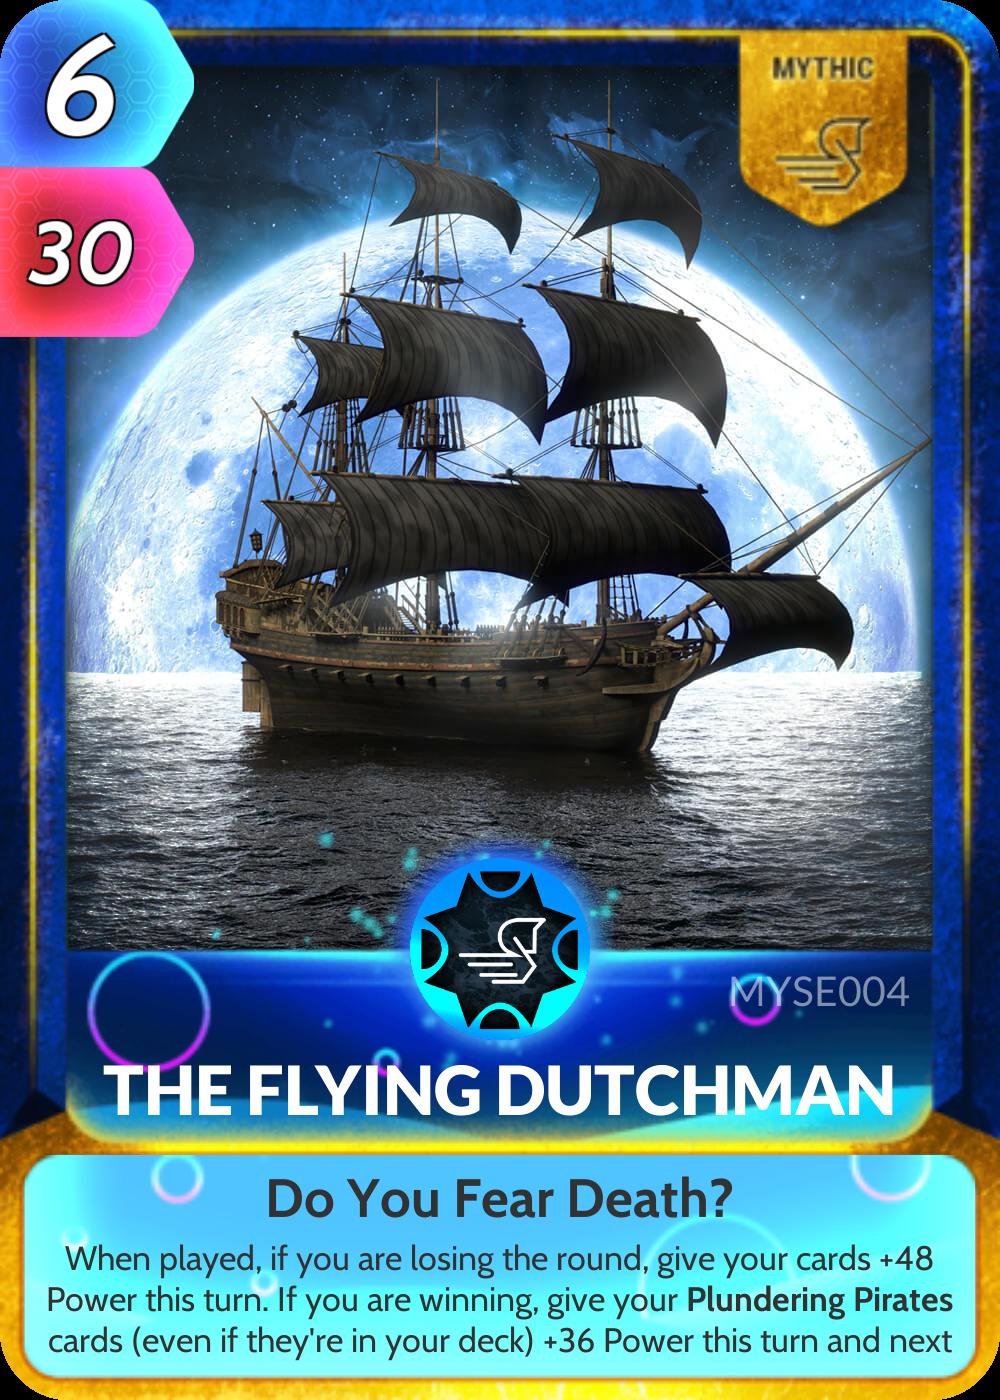 The Flying Dutchman